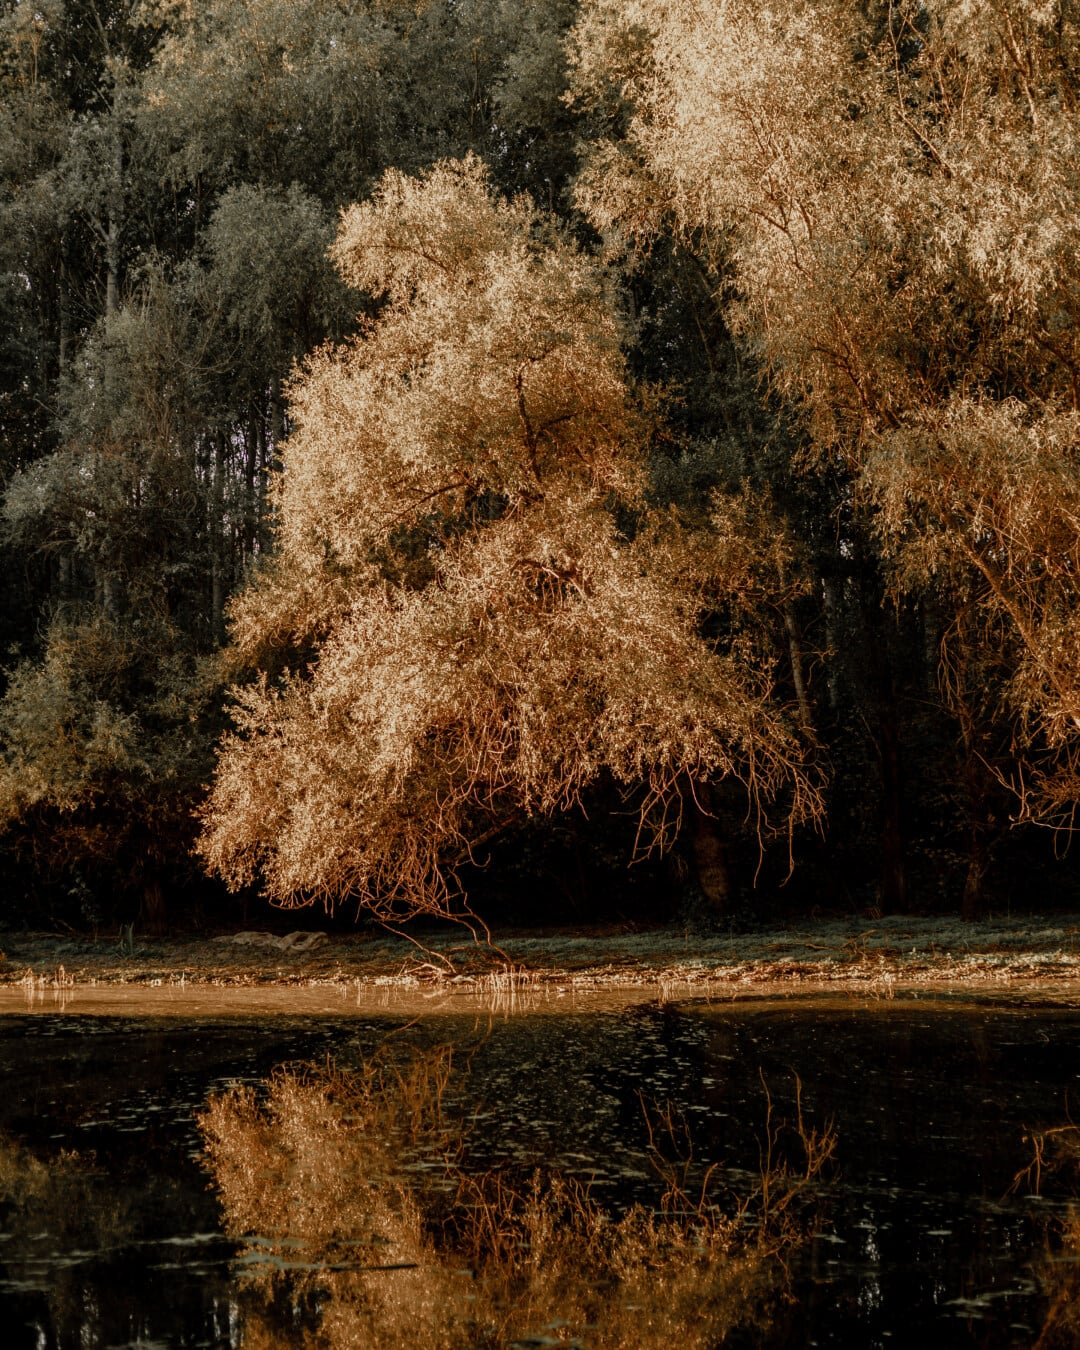 Bäume, Herbstsaison, am See, goldener Schein, Landschaft, Holz, Struktur, Natur, Park, Farbe